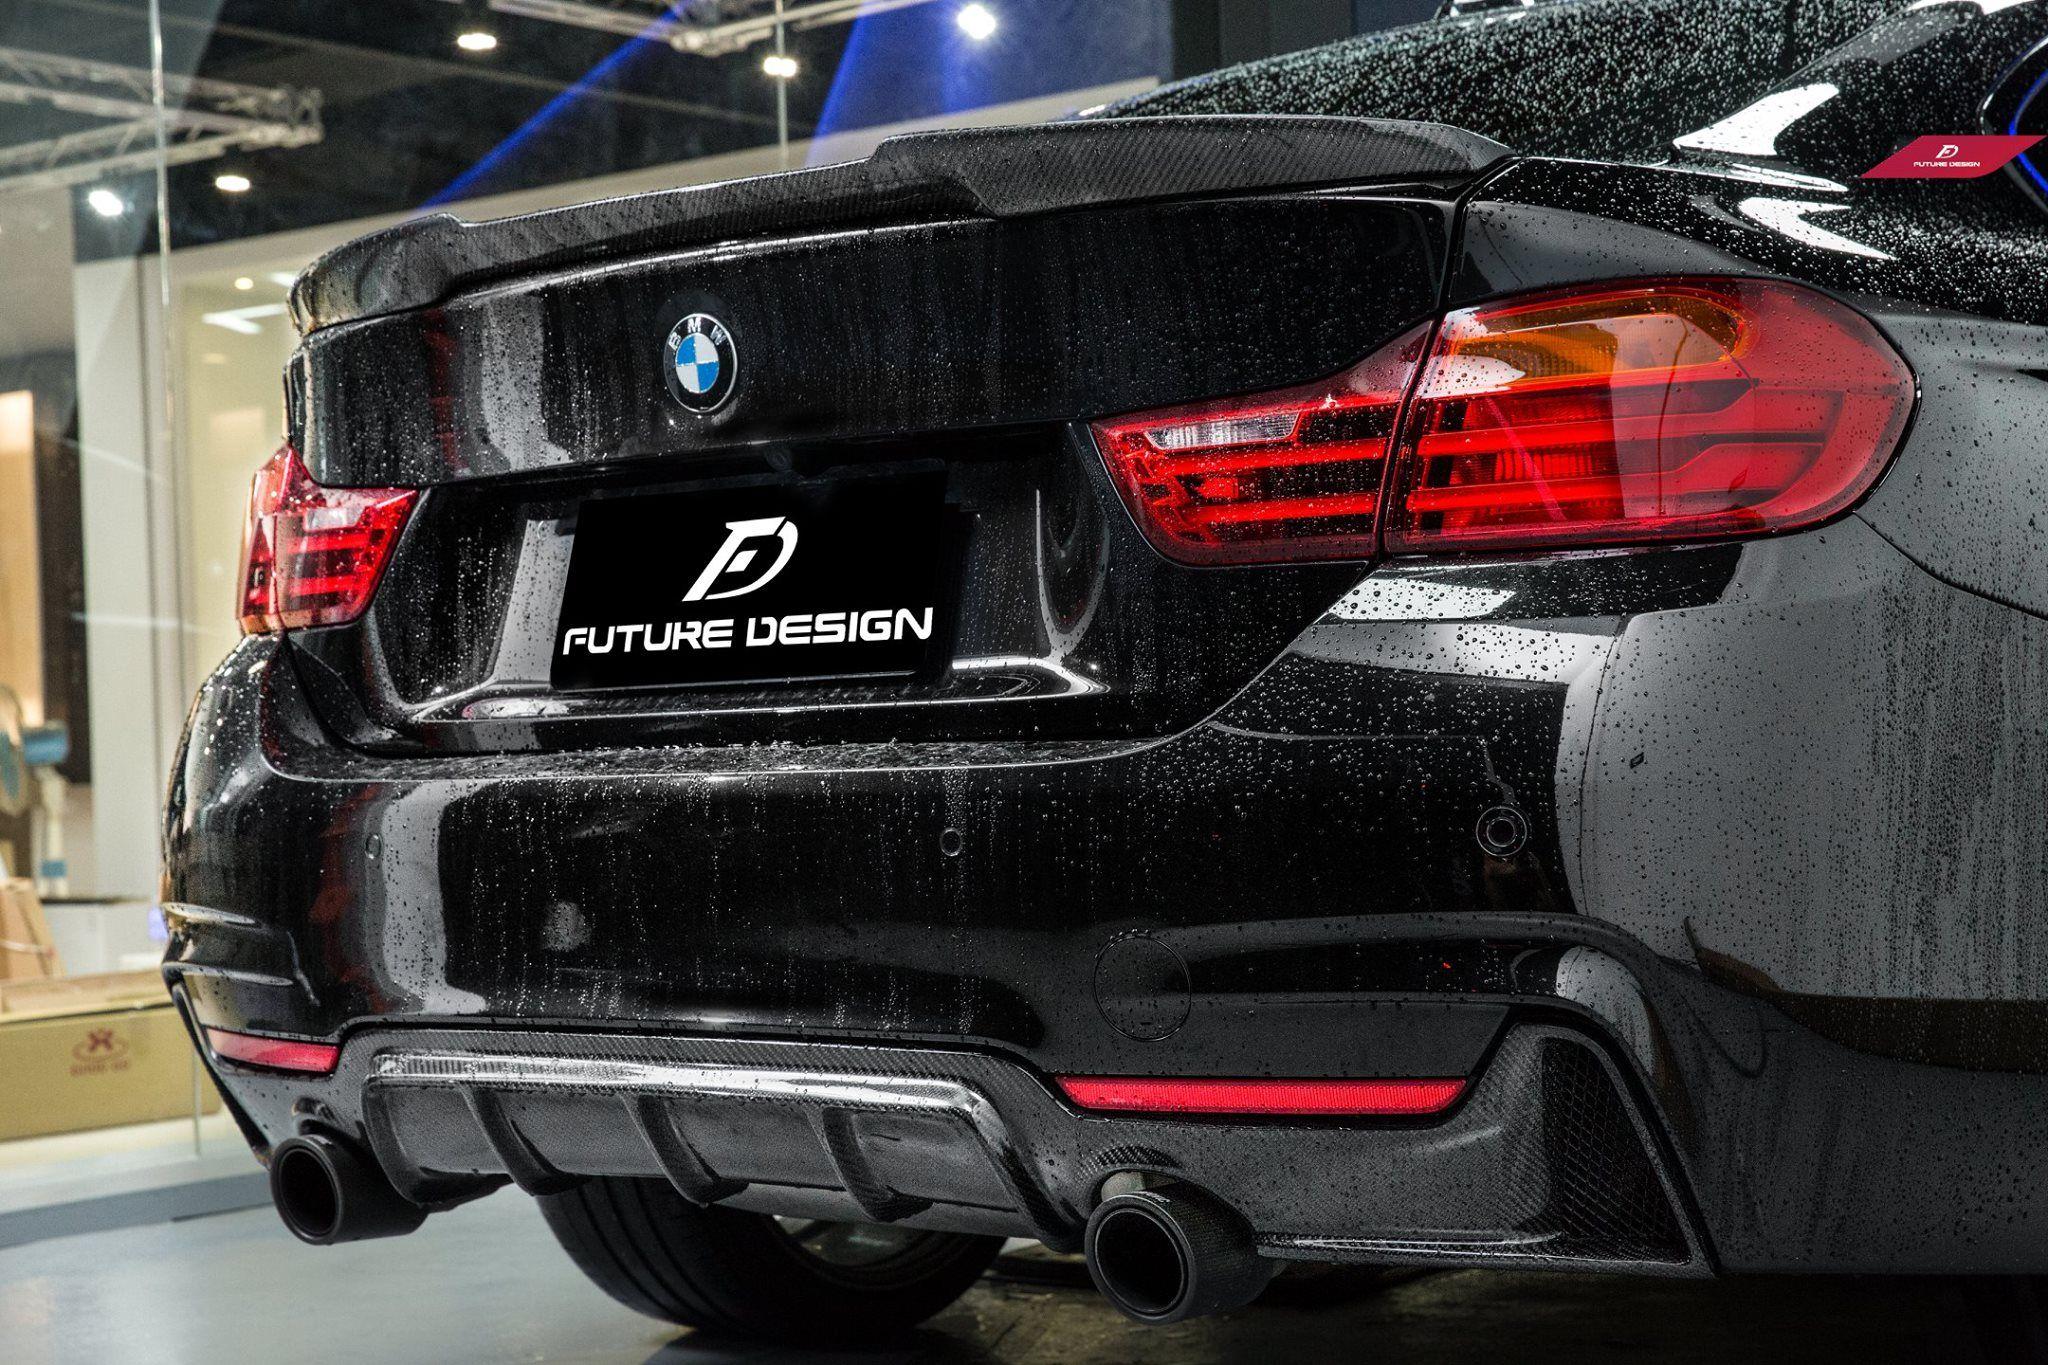 Oe Performance Style Carbon Fiber Diffuser F32 F33 F36 435i 440i